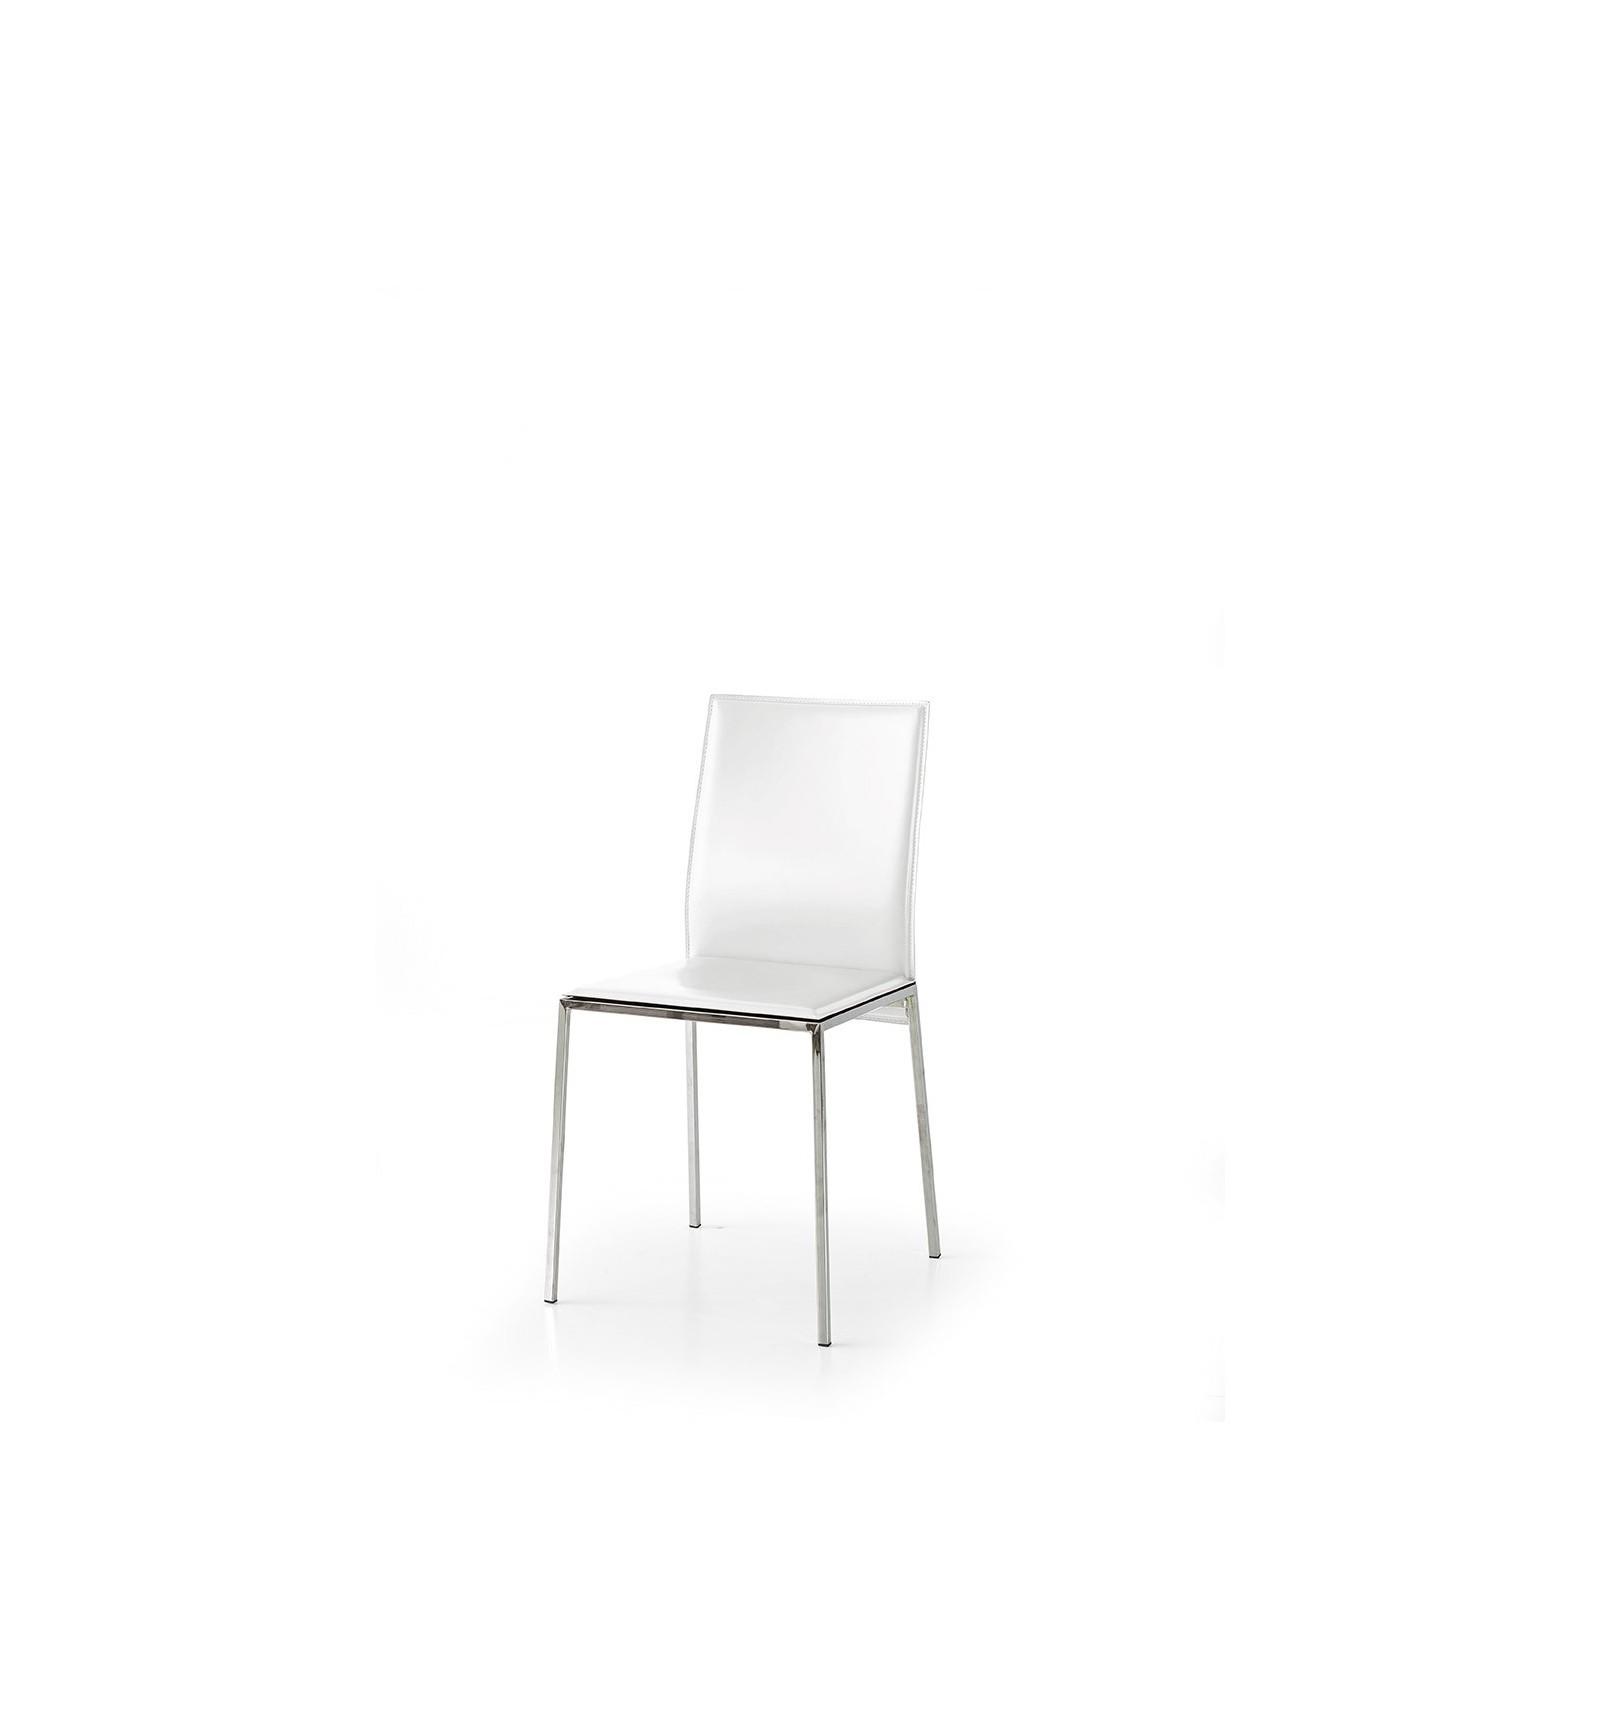 Set 2 sedie ecopelle bianca art w660 m lo scrigno for Sedie bianche ecopelle